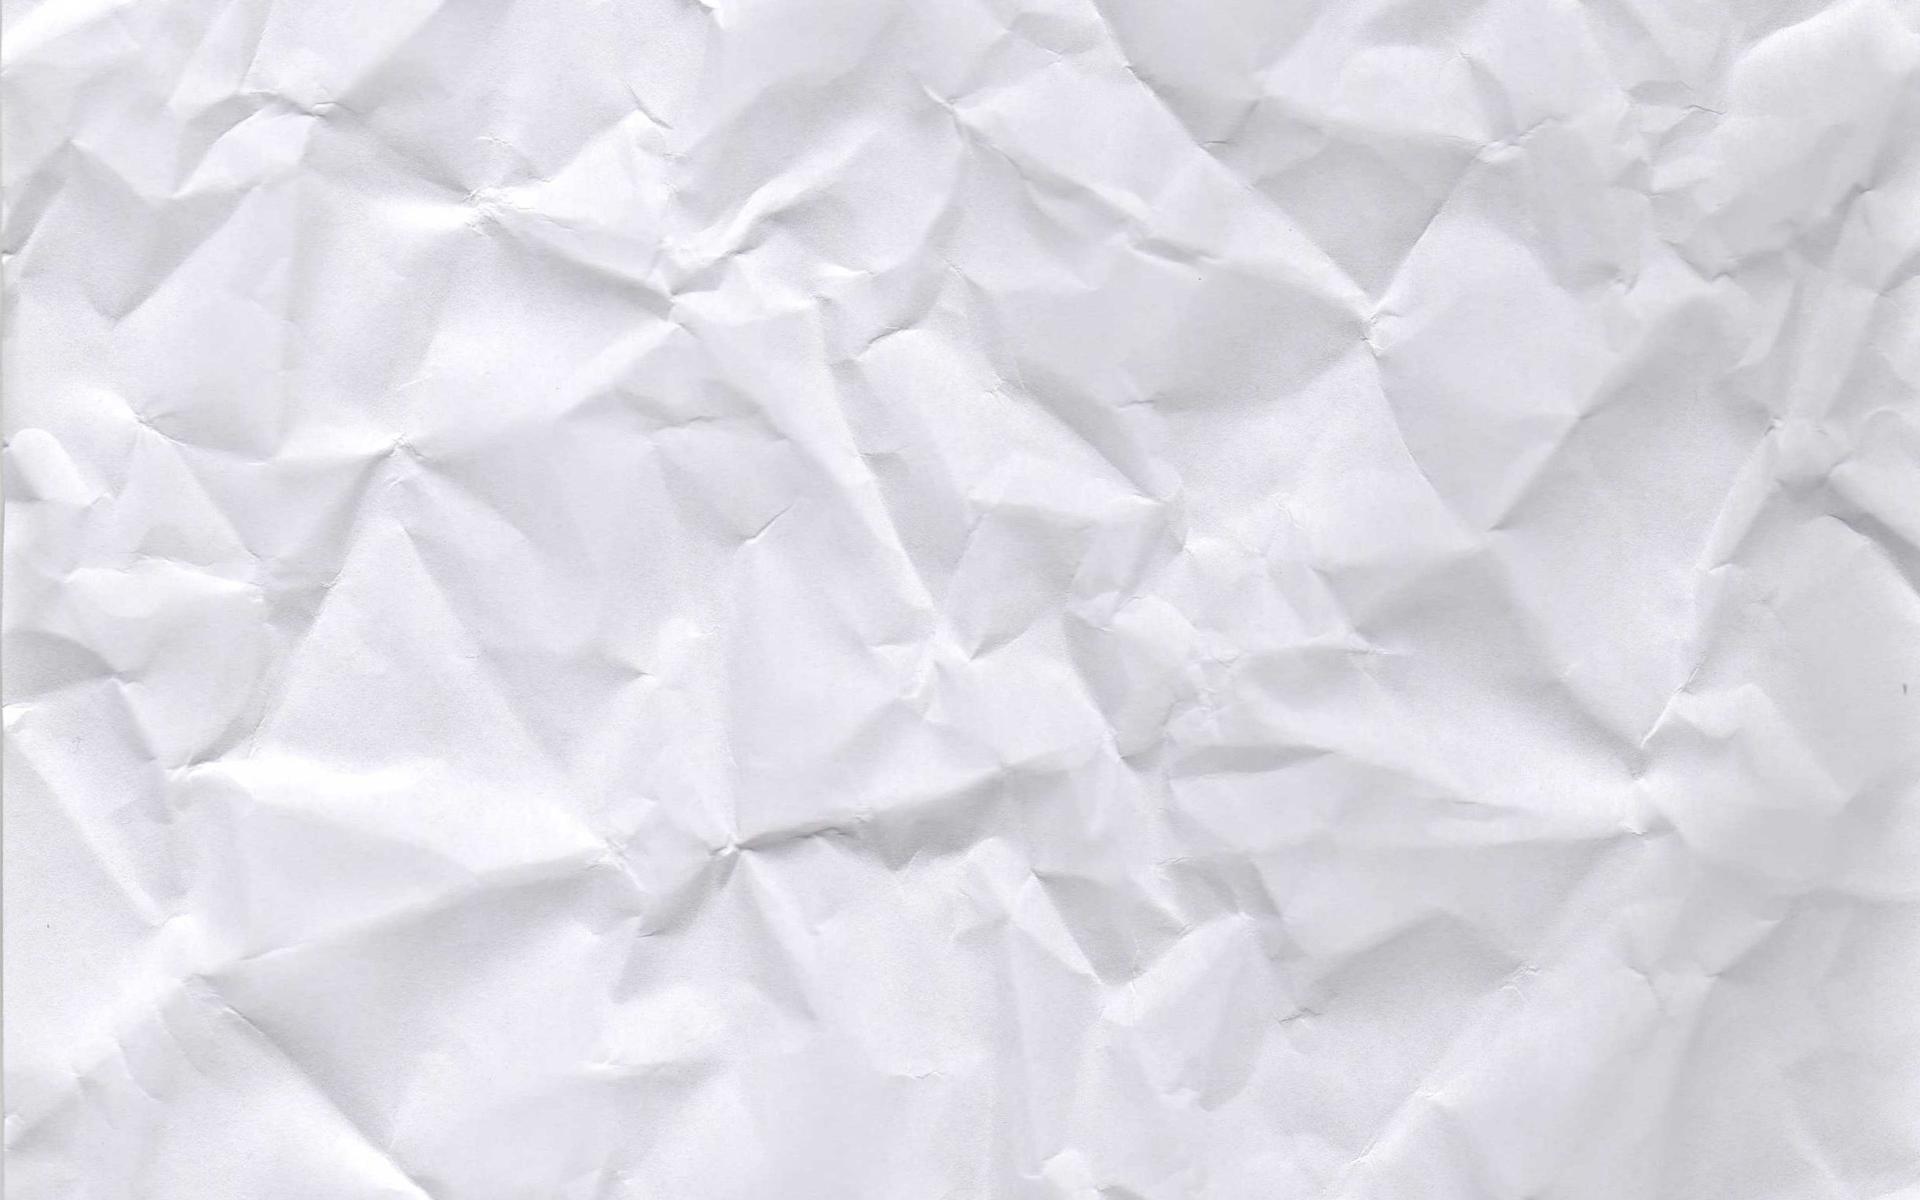 Wallpaper Paper 44 Wallpapers – Adorable Wallpapers